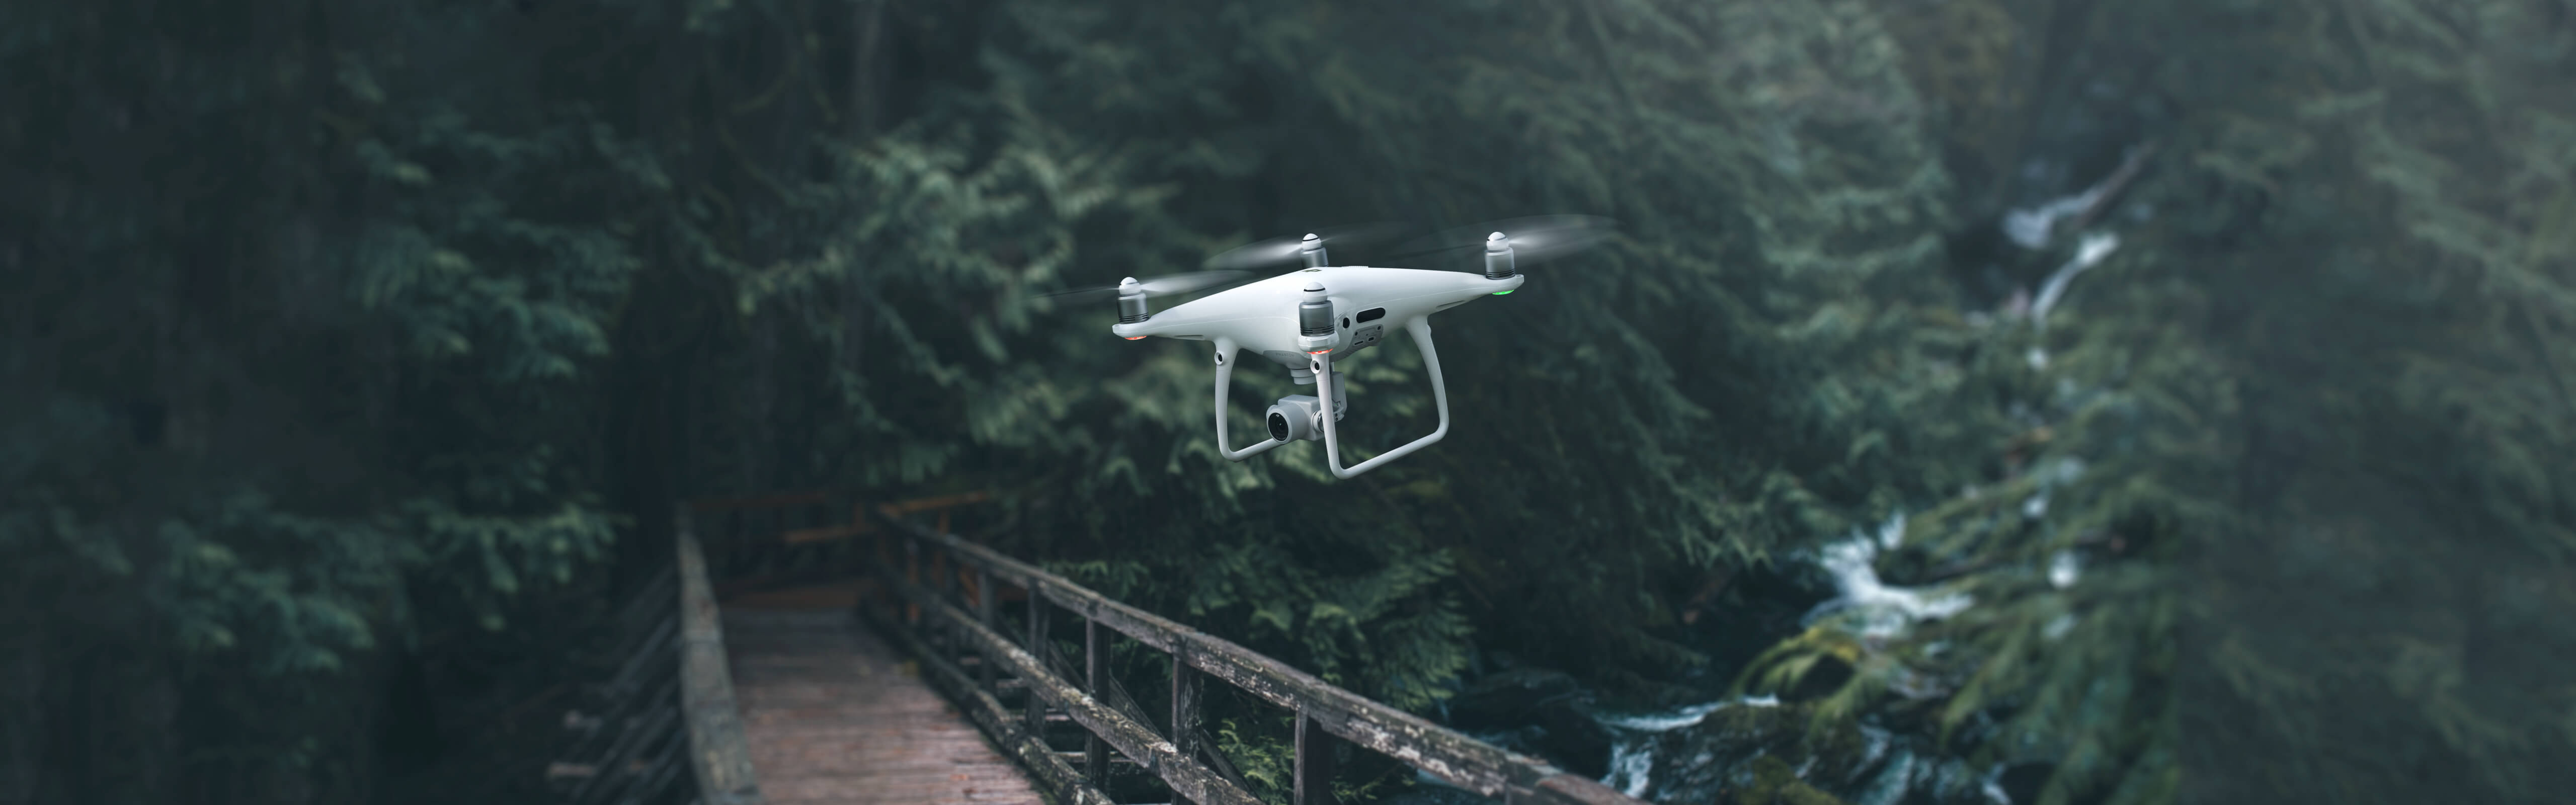 DJI Phantom 4 Pro Plus V2.0 - 4K Drone With Collision ...